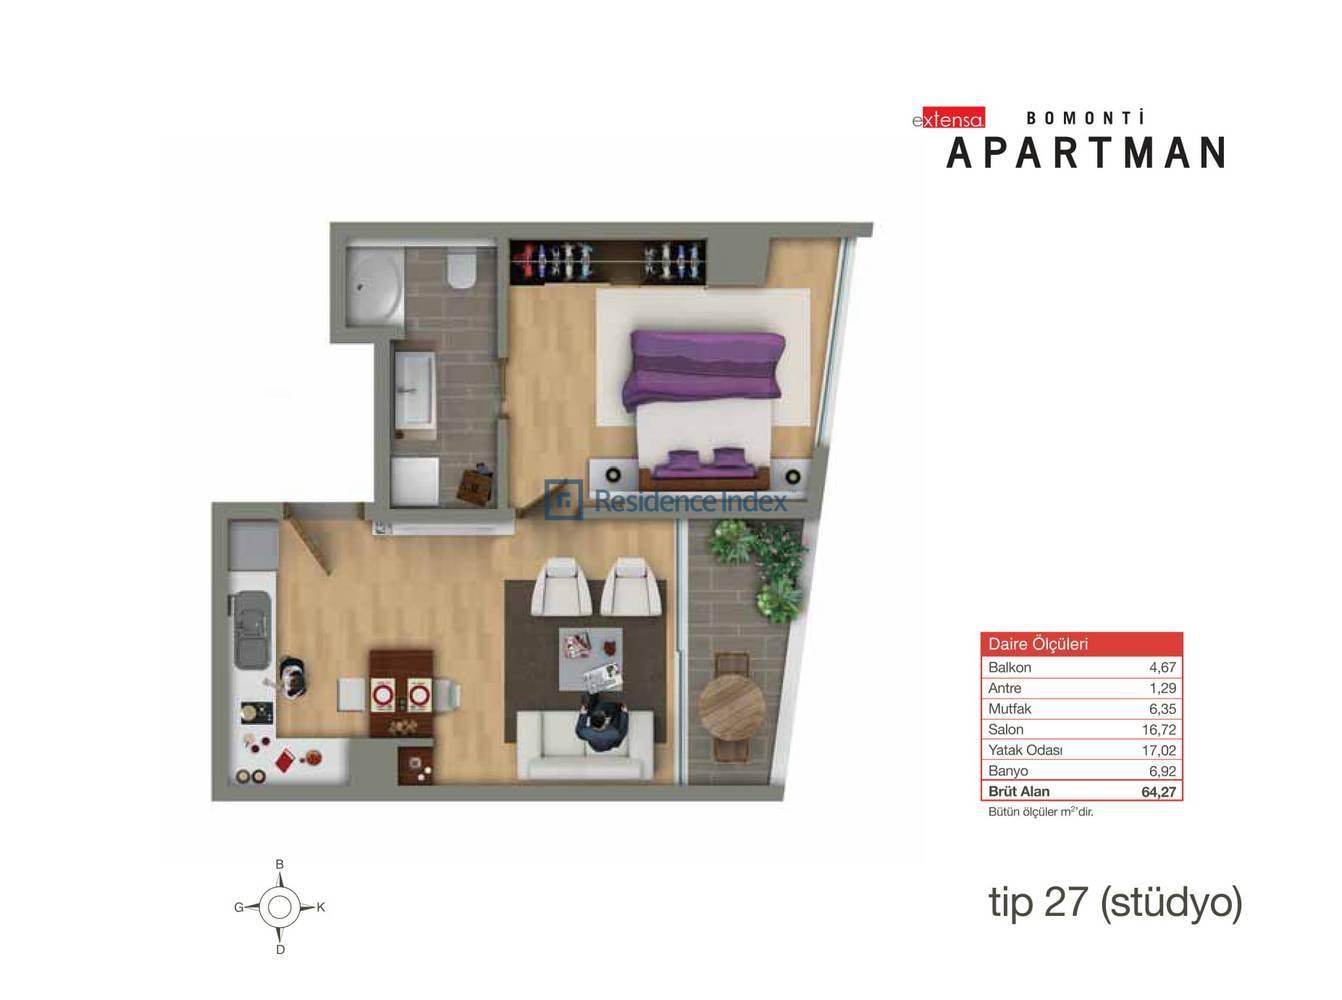 Bomonti Apartmanı Tip 27